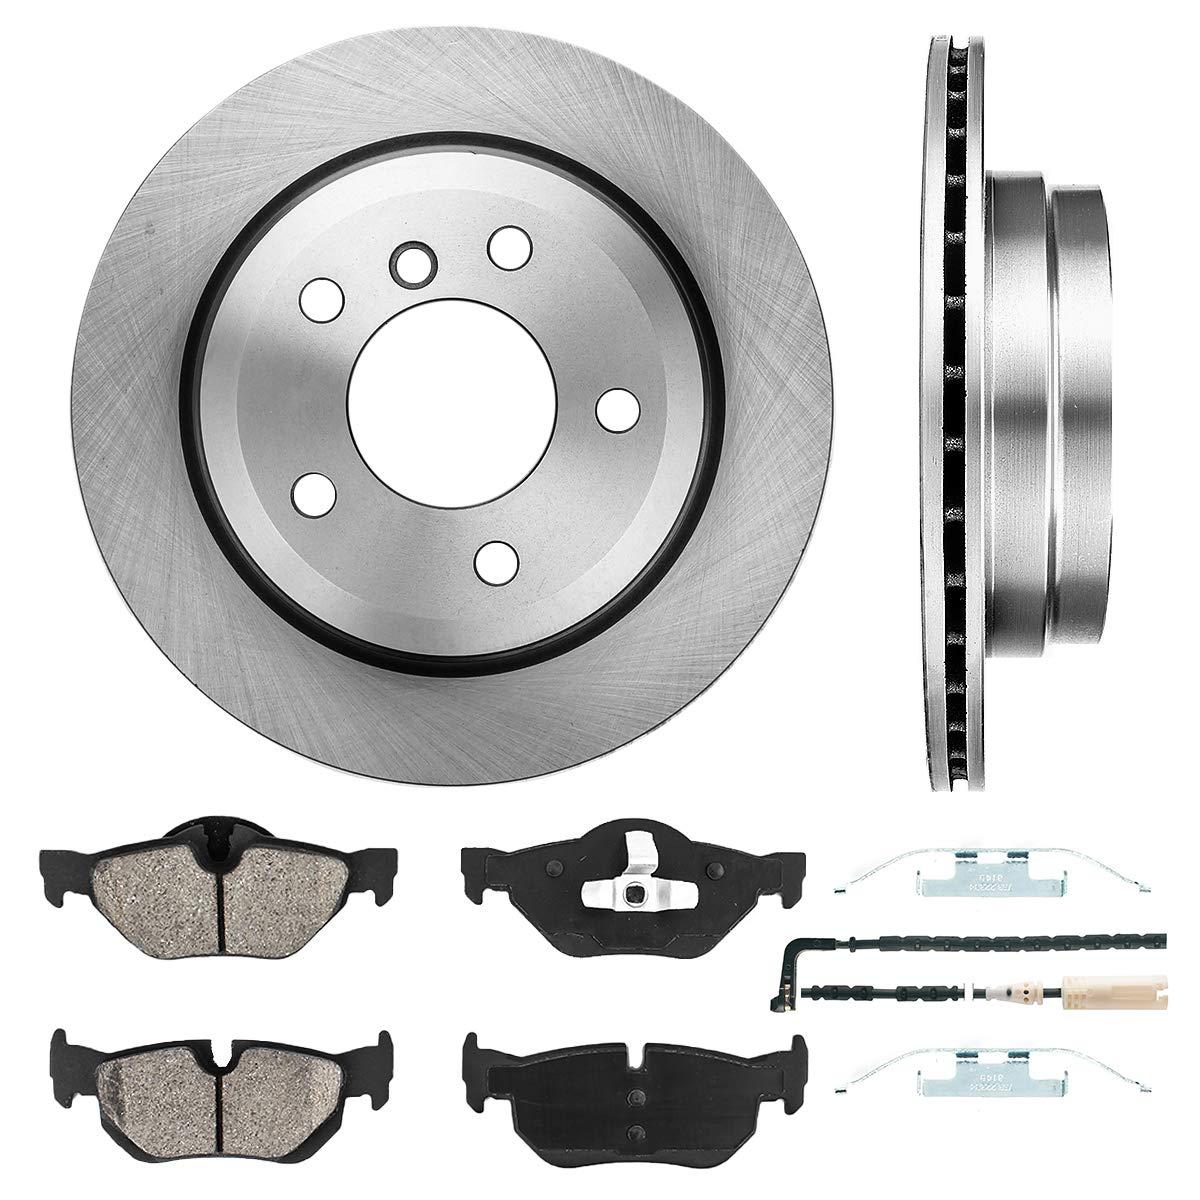 [ E90 ] REAR 299.8 mm Premium OE 5 Lug [2] Brake Disc Rotors + [4] Ceramic Brake Pads + Sensors + Hardware CRK11067